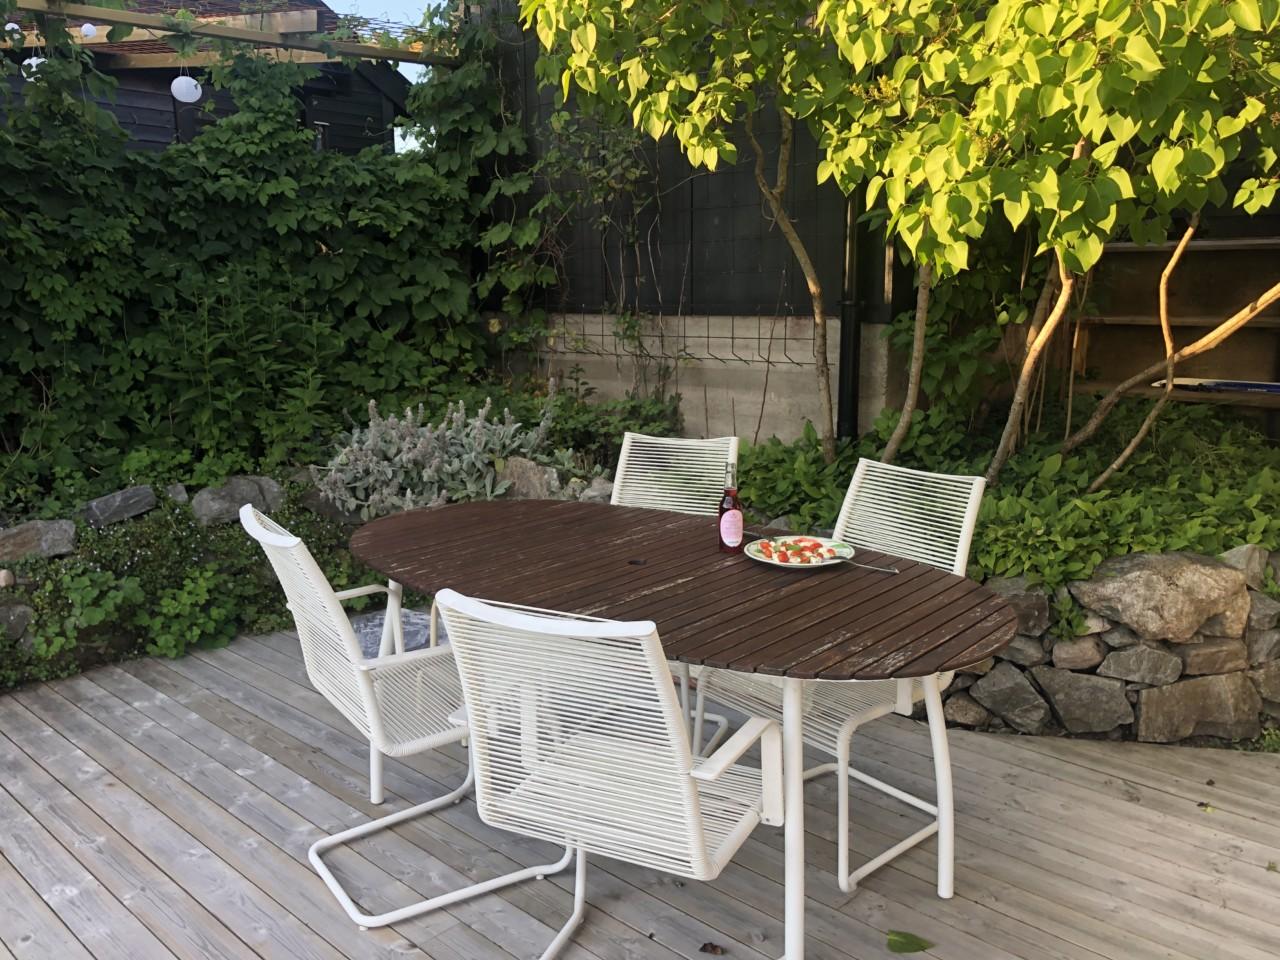 the-first-supper-caprese-flyttekaos-nytt-hjem-terrasse-cider